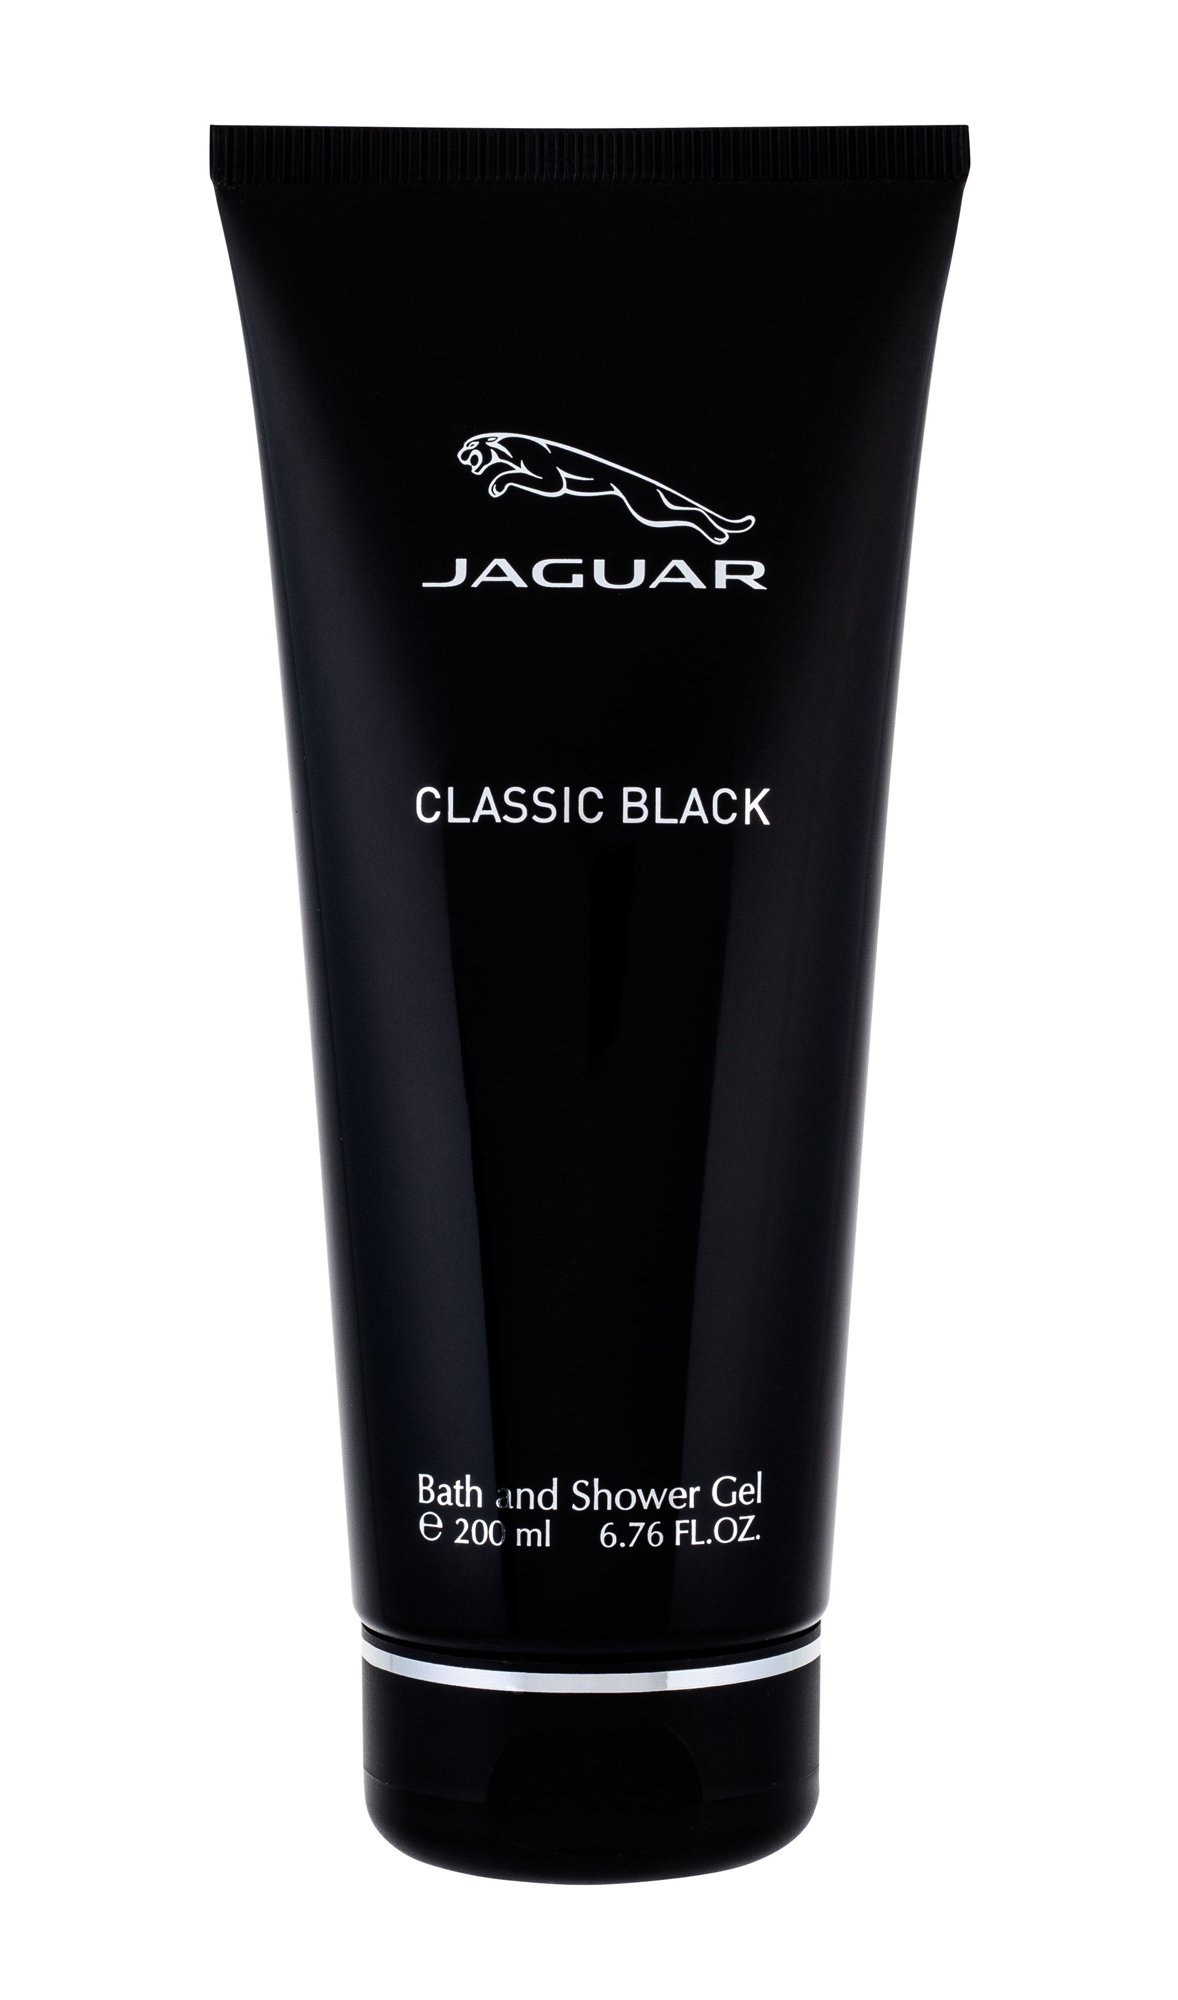 Jaguar Classic Black Shower Gel 200ml